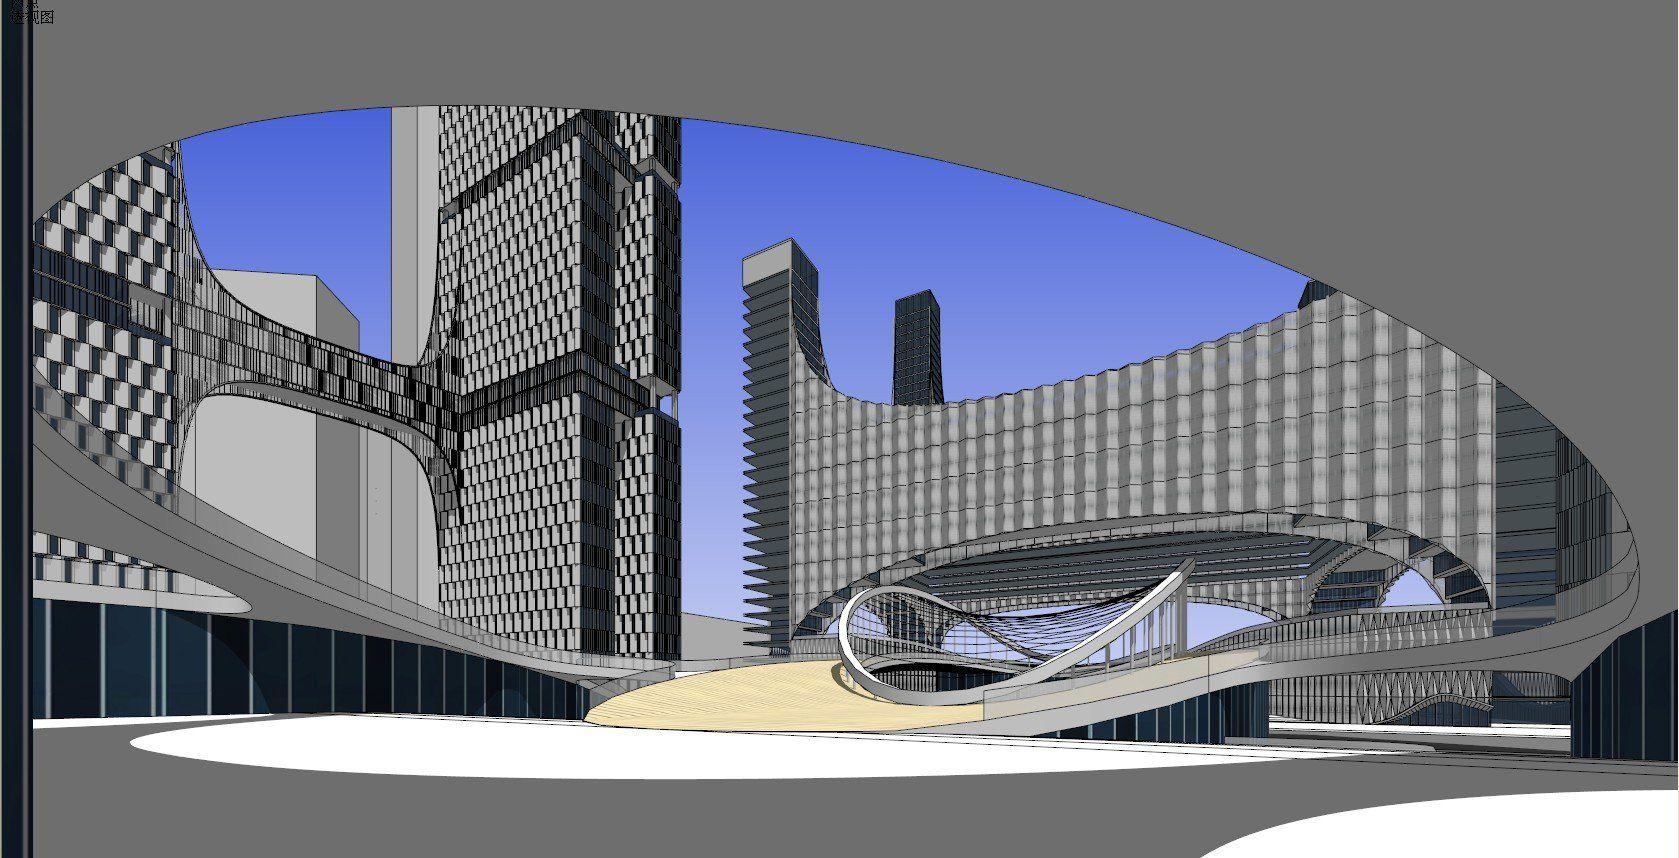 ★Sketchup 3D ModelsSkyscraper Sketchup Models Sketchup